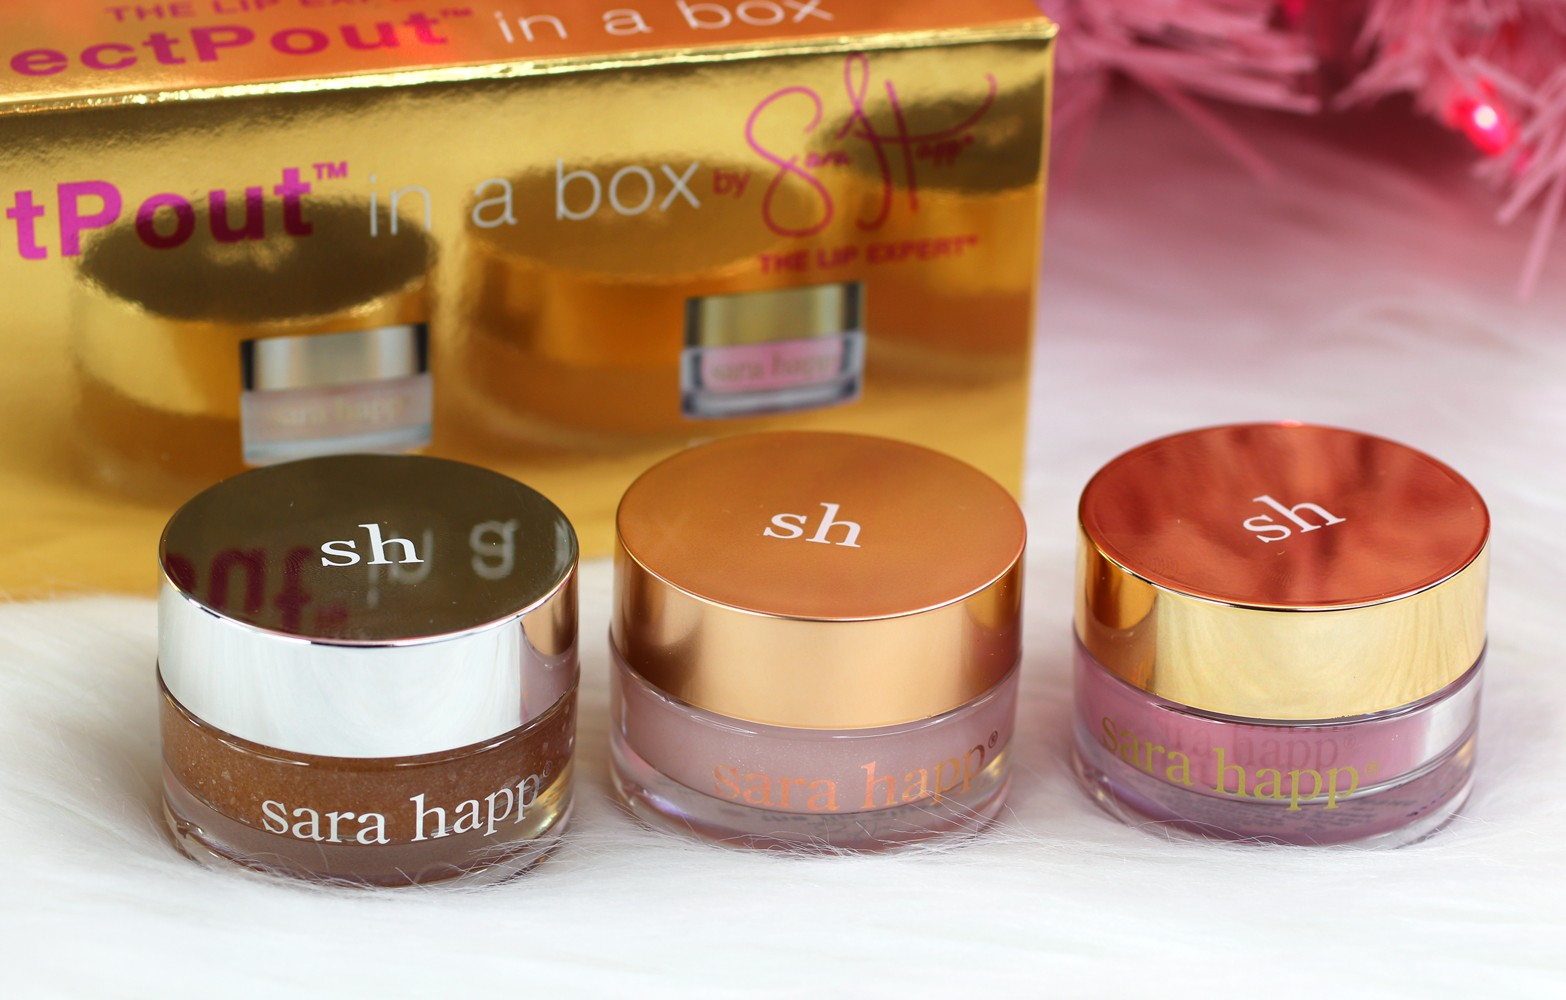 Sara Happ Perfect Pout Lip Gift Set